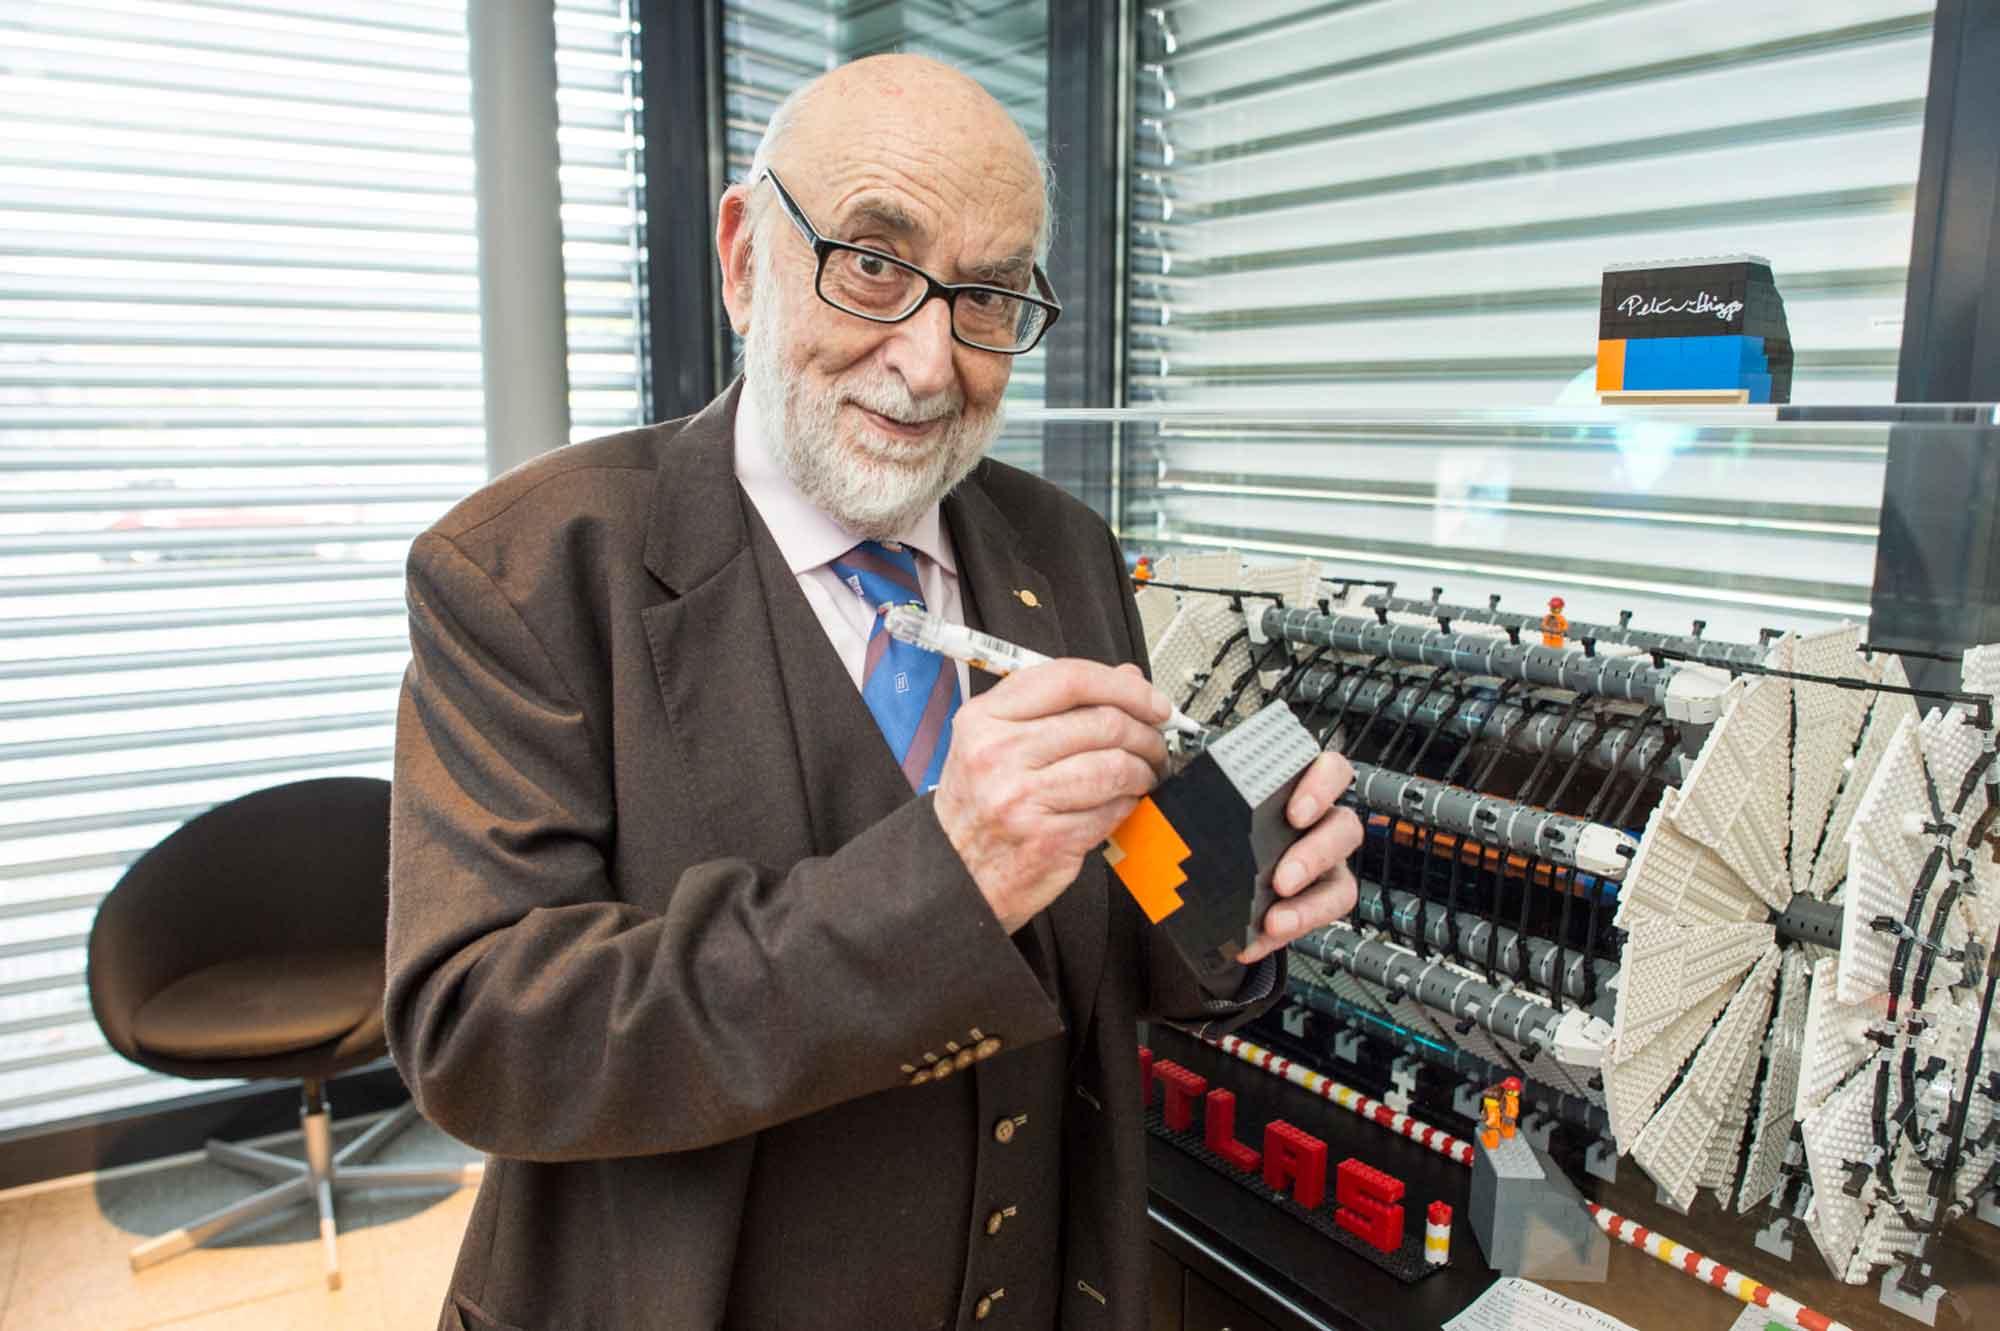 The Higgs Boson Cern